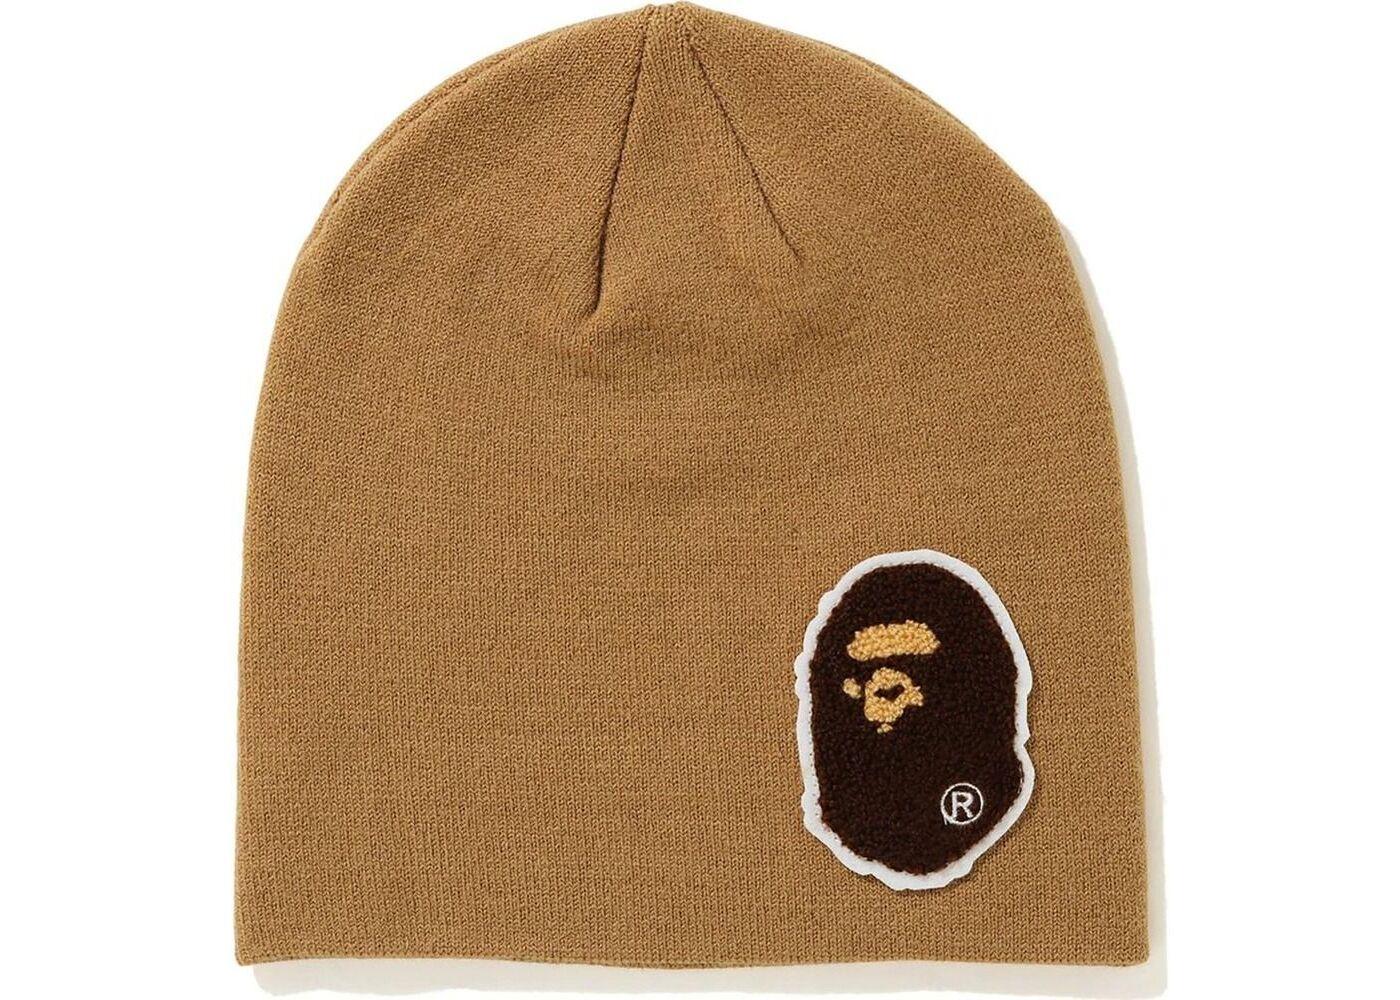 Bape Big Ape Head Knit Cap Beige (FW20)の写真